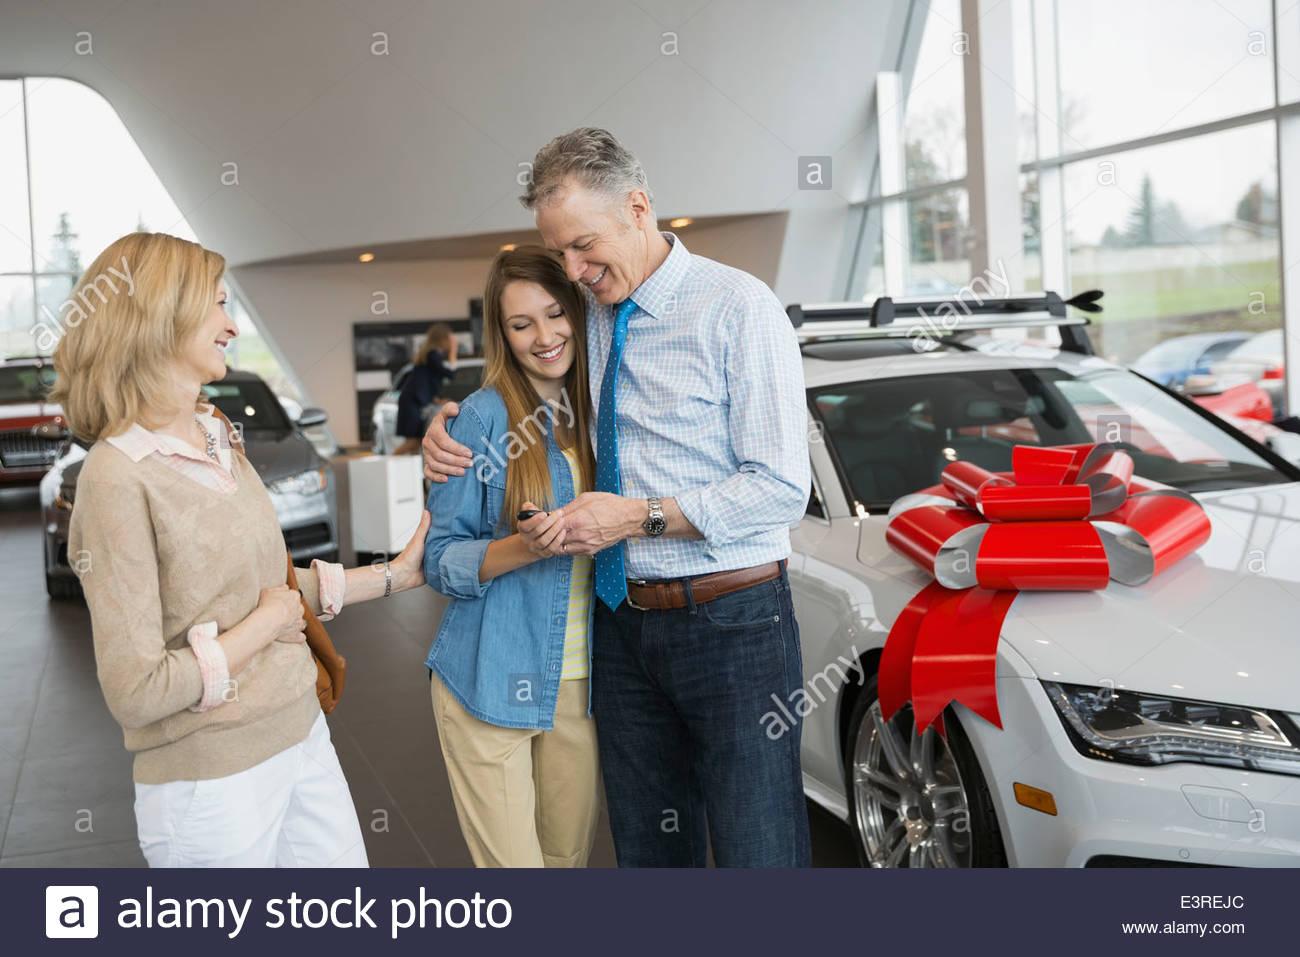 Parents buying daughter car in dealership showroom - Stock Image